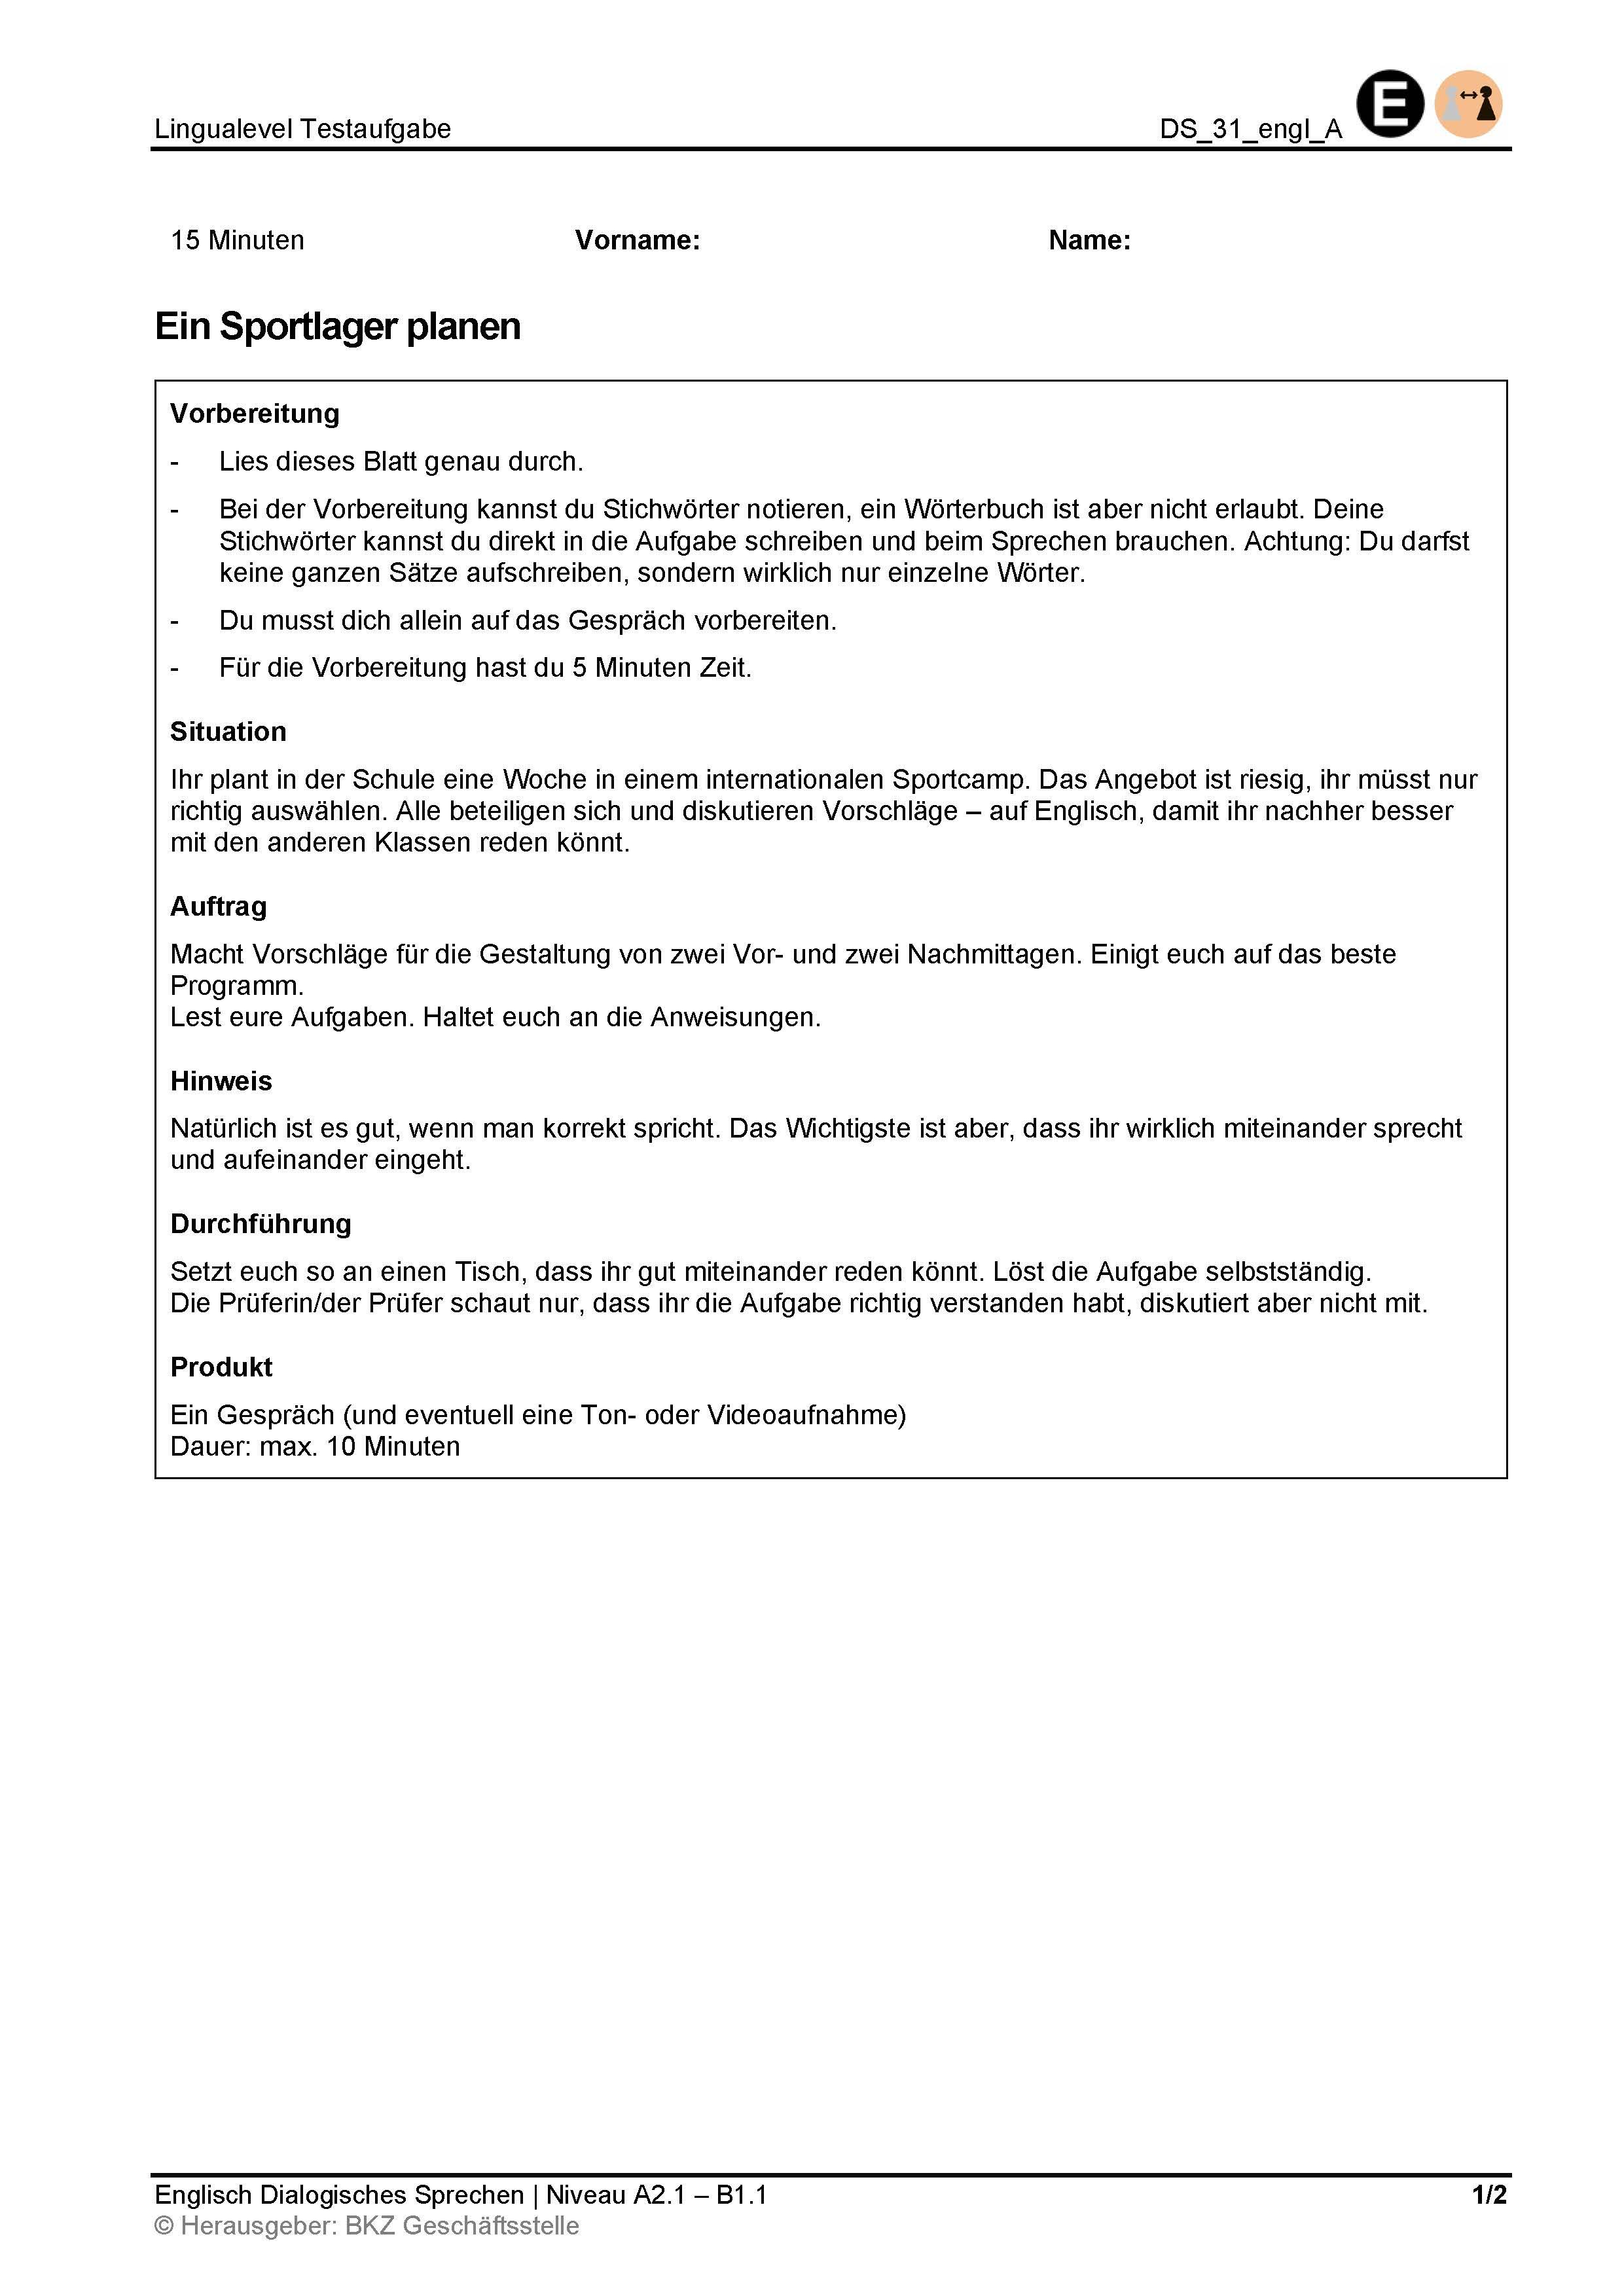 Preview image for LOM object Dialogisches Sprechen: Ein Sportlager planen